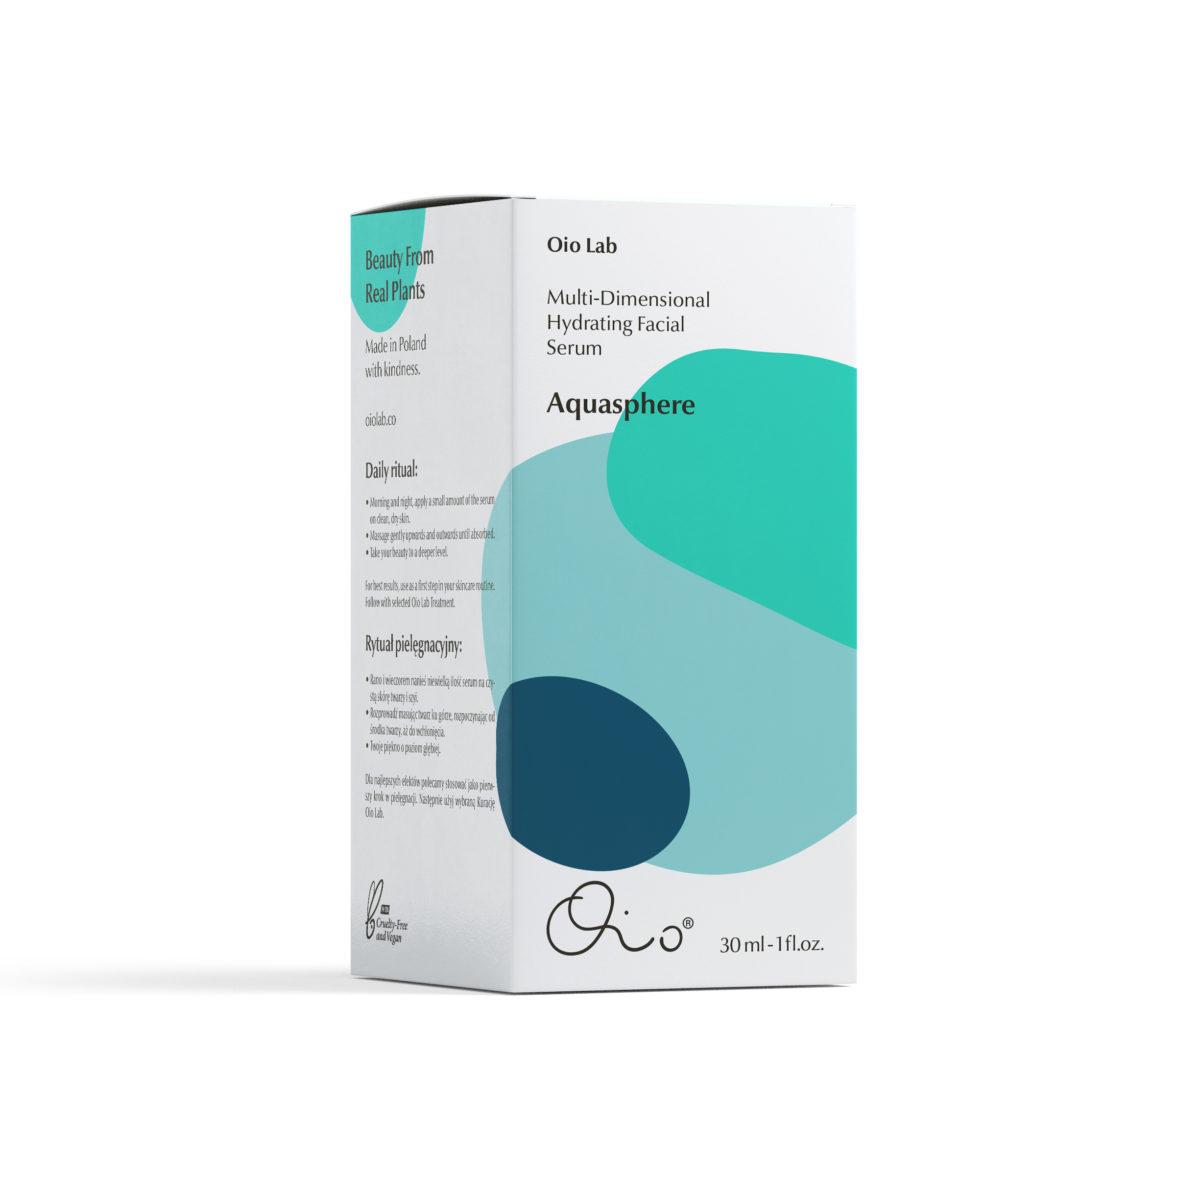 OIO LAB Aquasphere Hydrating Facial Serum | SoBio Beauty Boutique | Cruelty-Free Concept Store 3